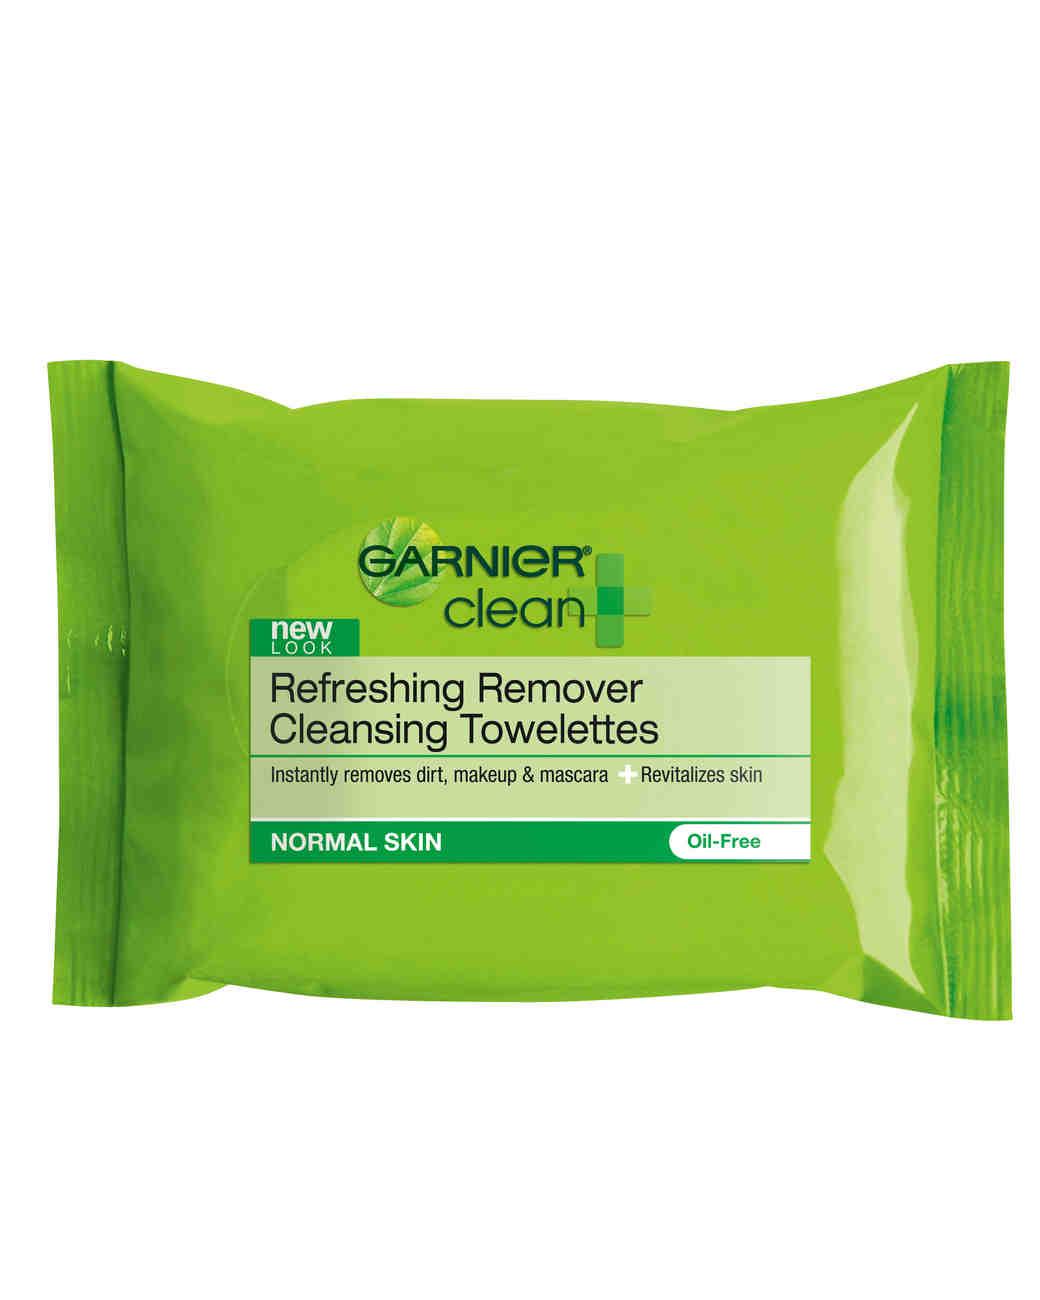 garnier-clean-refreshing-remover-cleansing-towelettes-0414.jpg